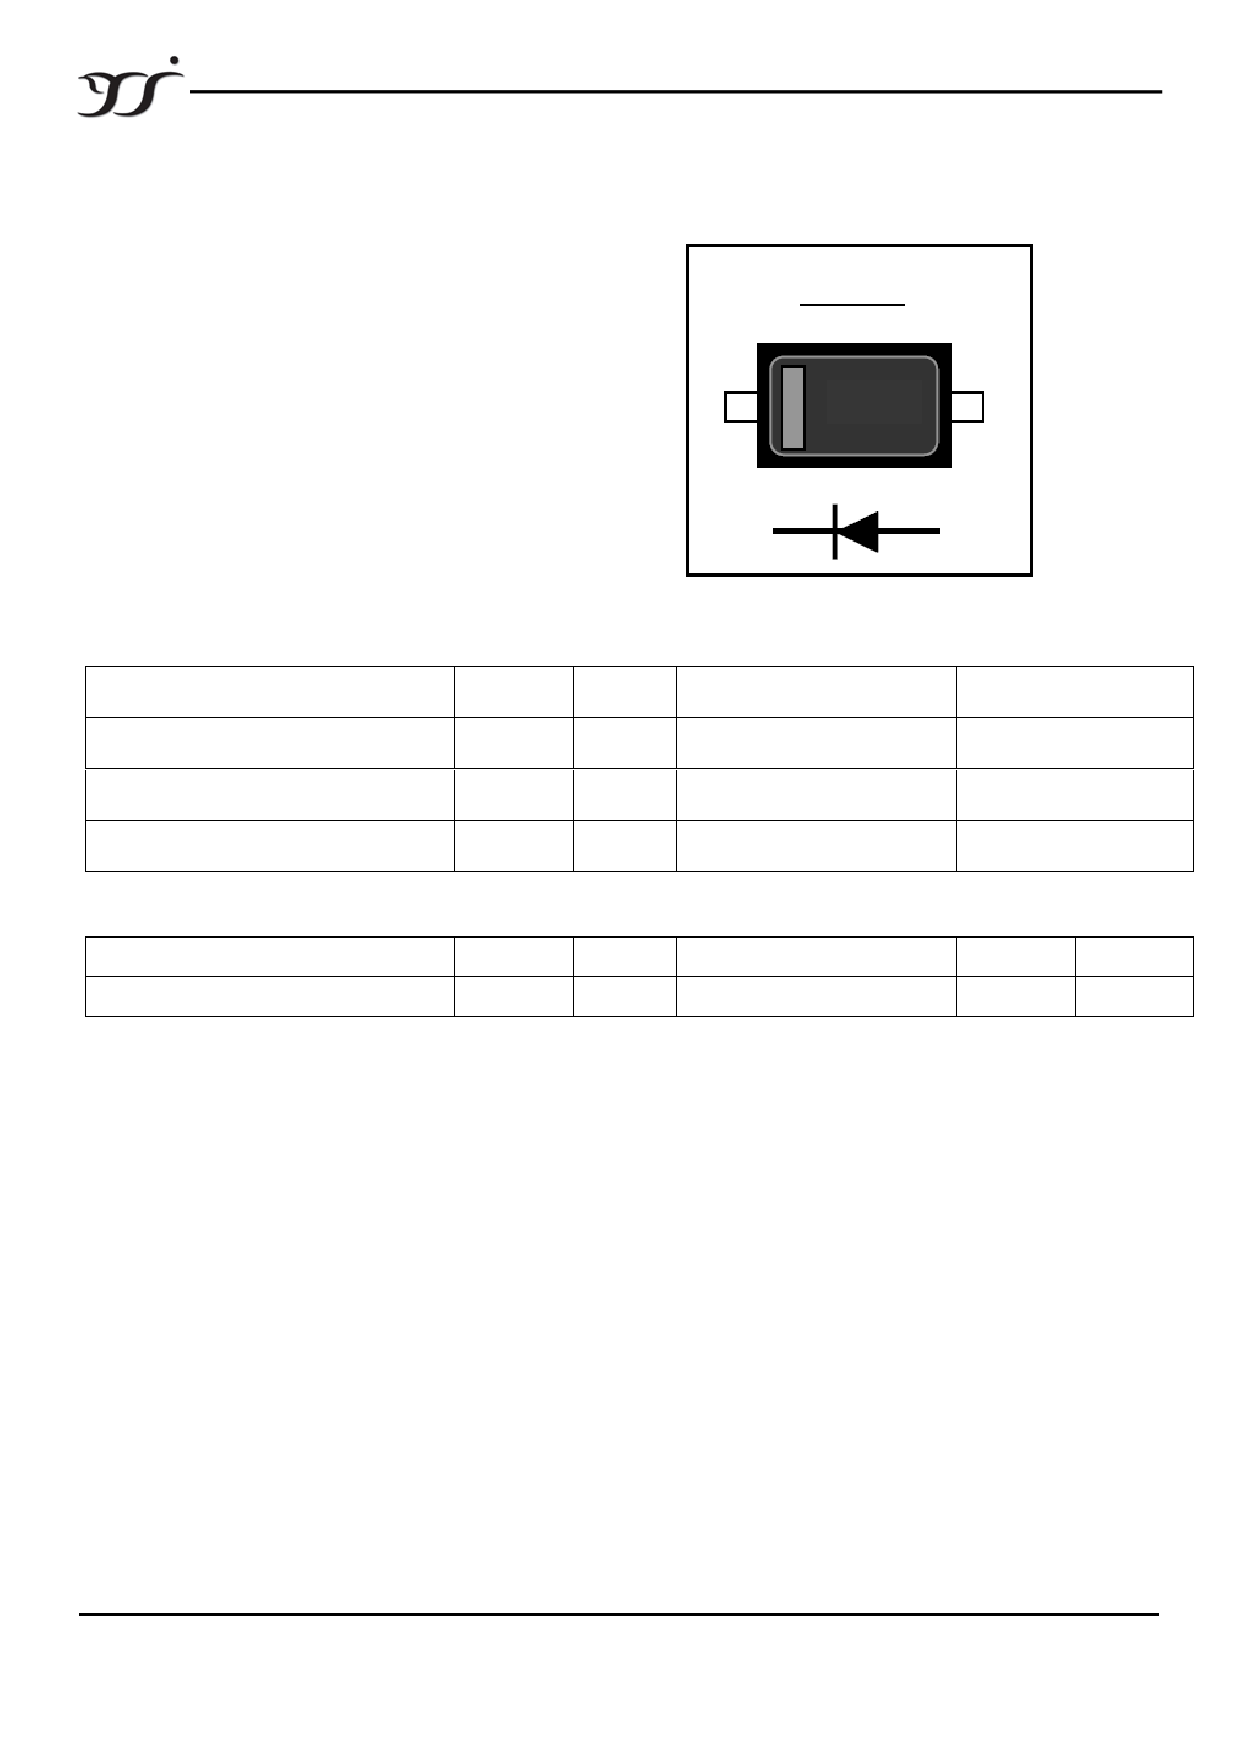 MMSZ5236B Datasheet